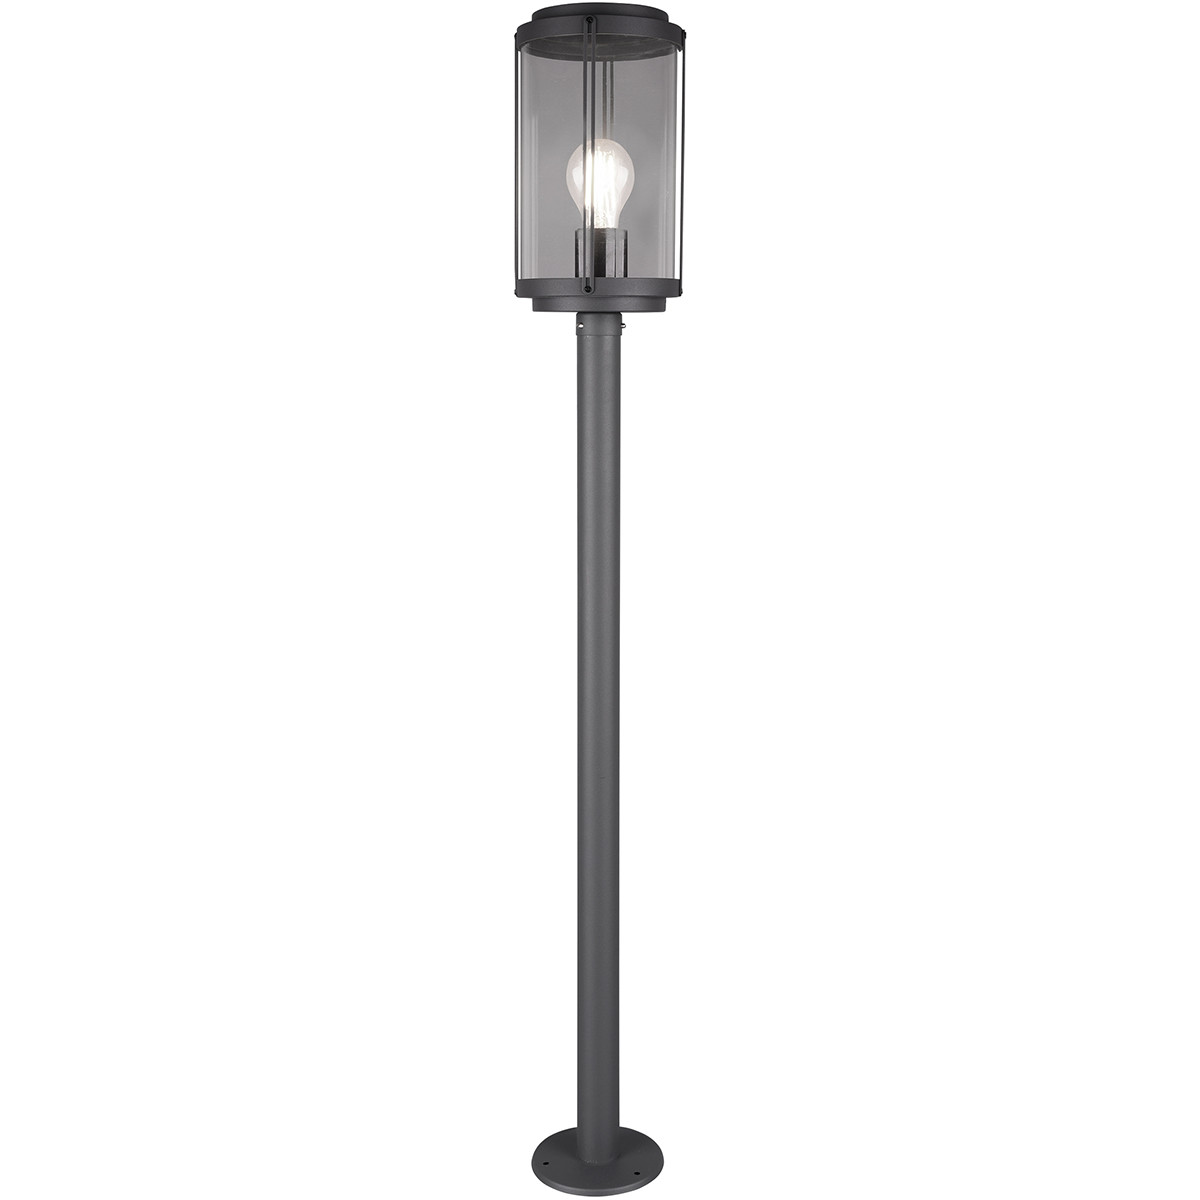 LED Tuinverlichting - Vloerlamp - Trion Taniron XL - Staand - E27 Fitting - Mat Zwart - Aluminium